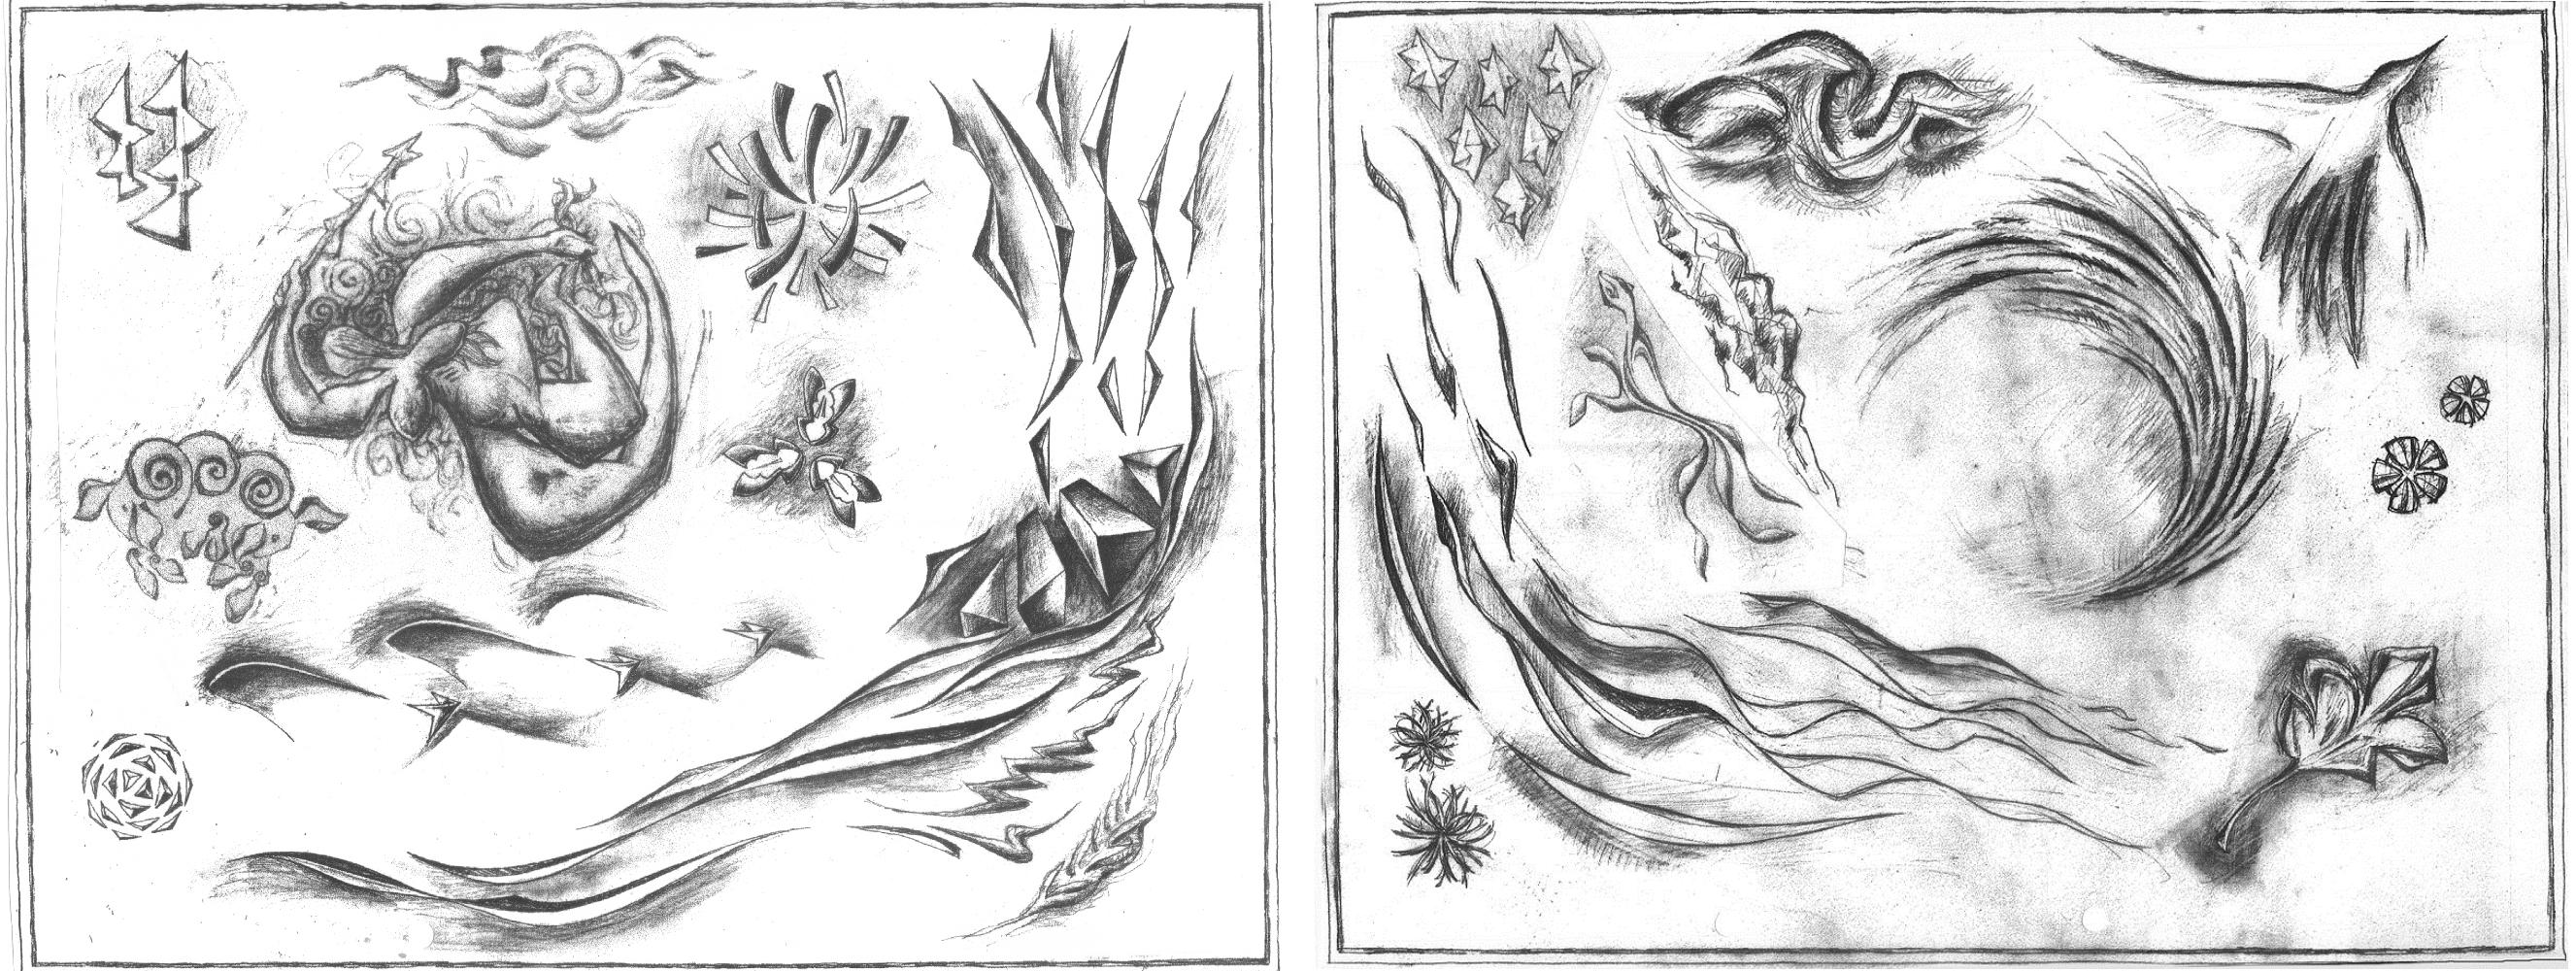 PFG final sketches